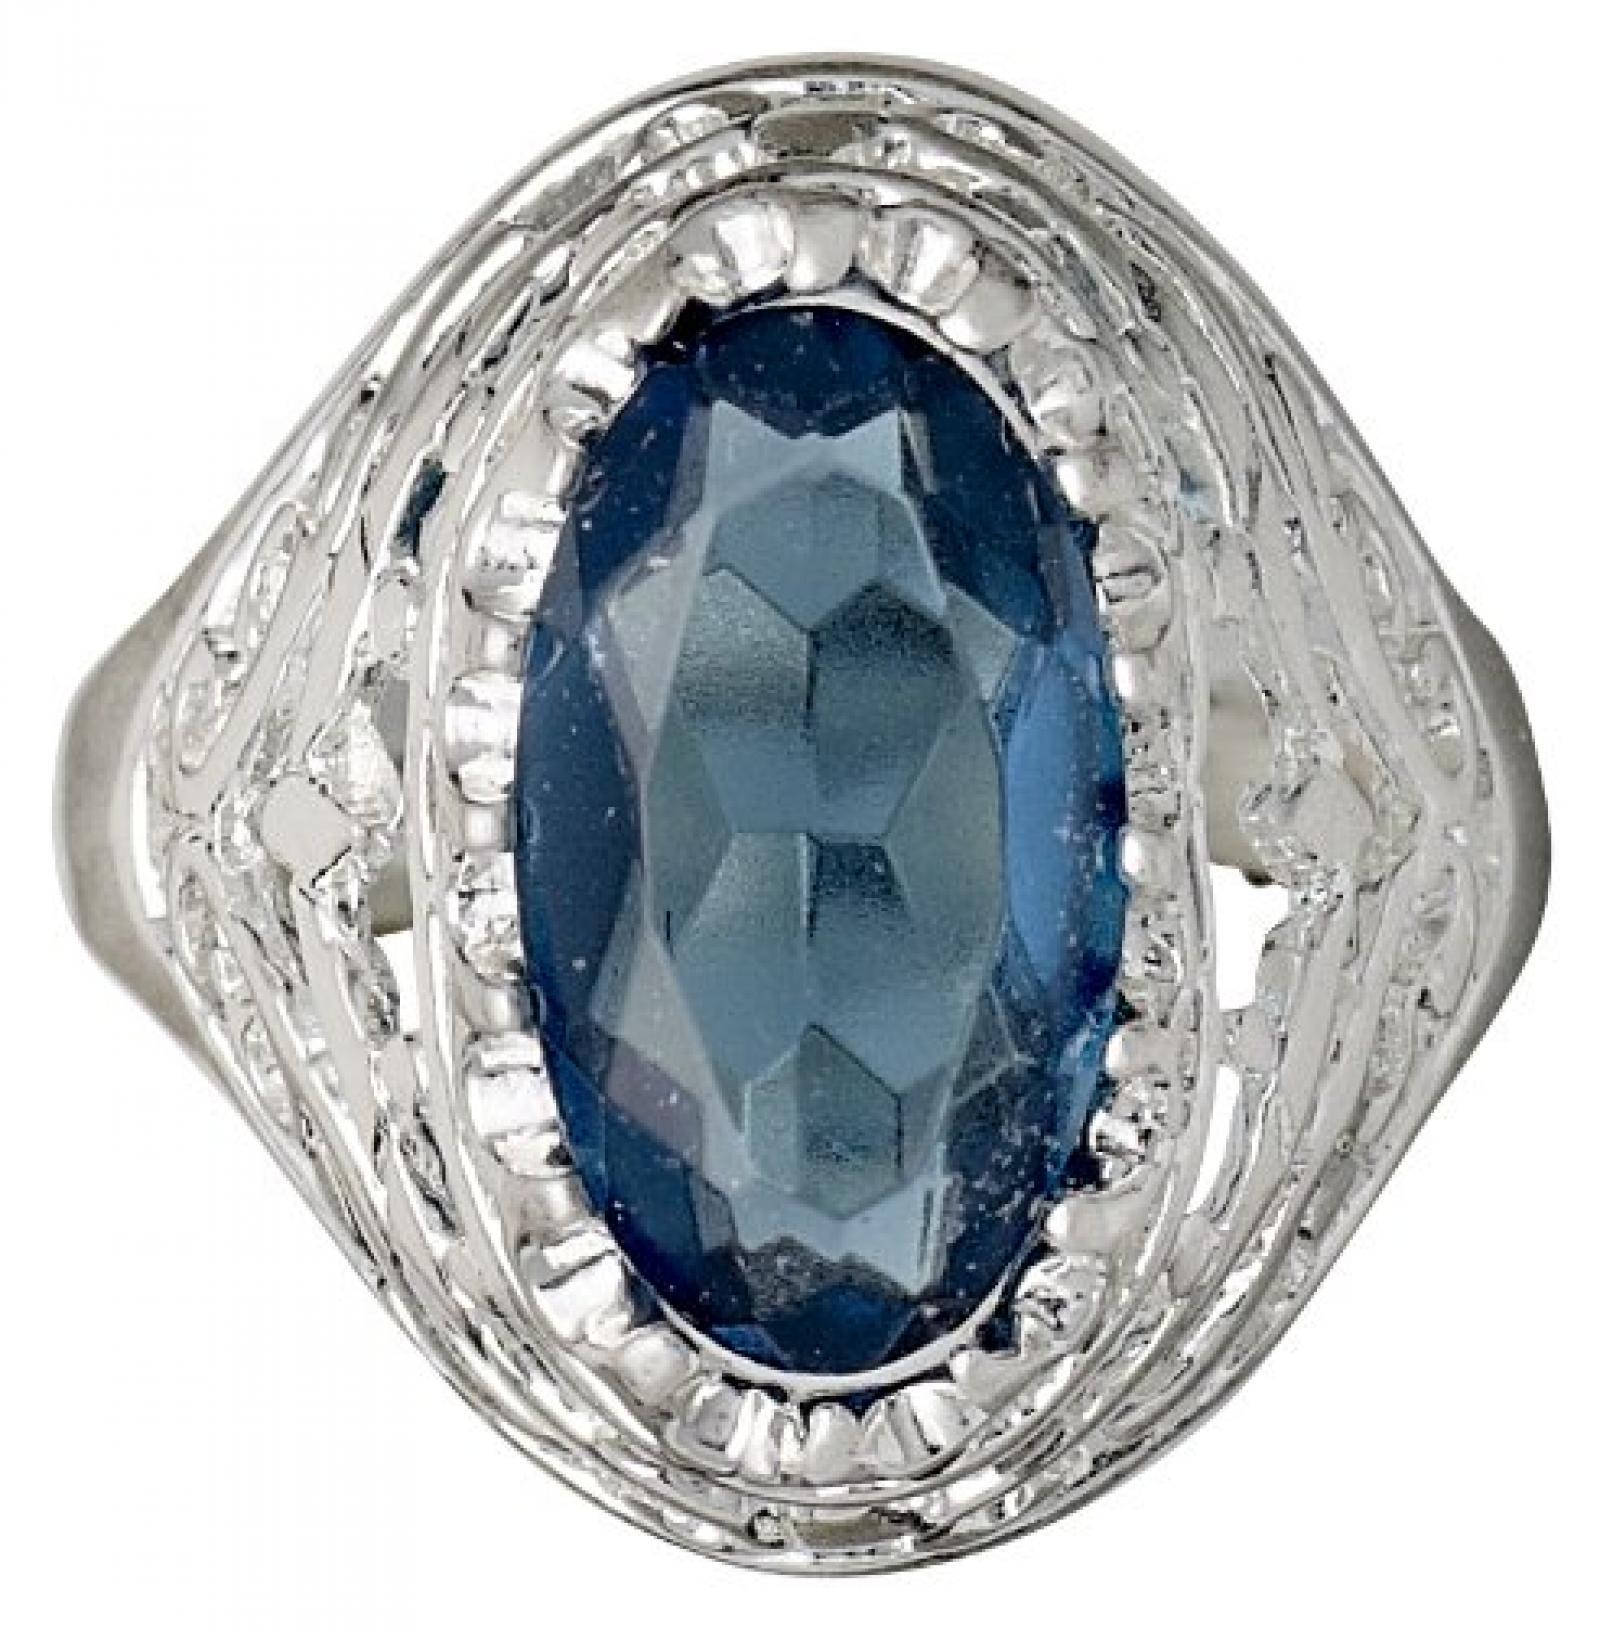 Pilgrim Jewelry Damen-Ring Messing Pilgrim Damen-Ring aus der Serie Russian loving versilbert,blau  2.0 cm 231336204